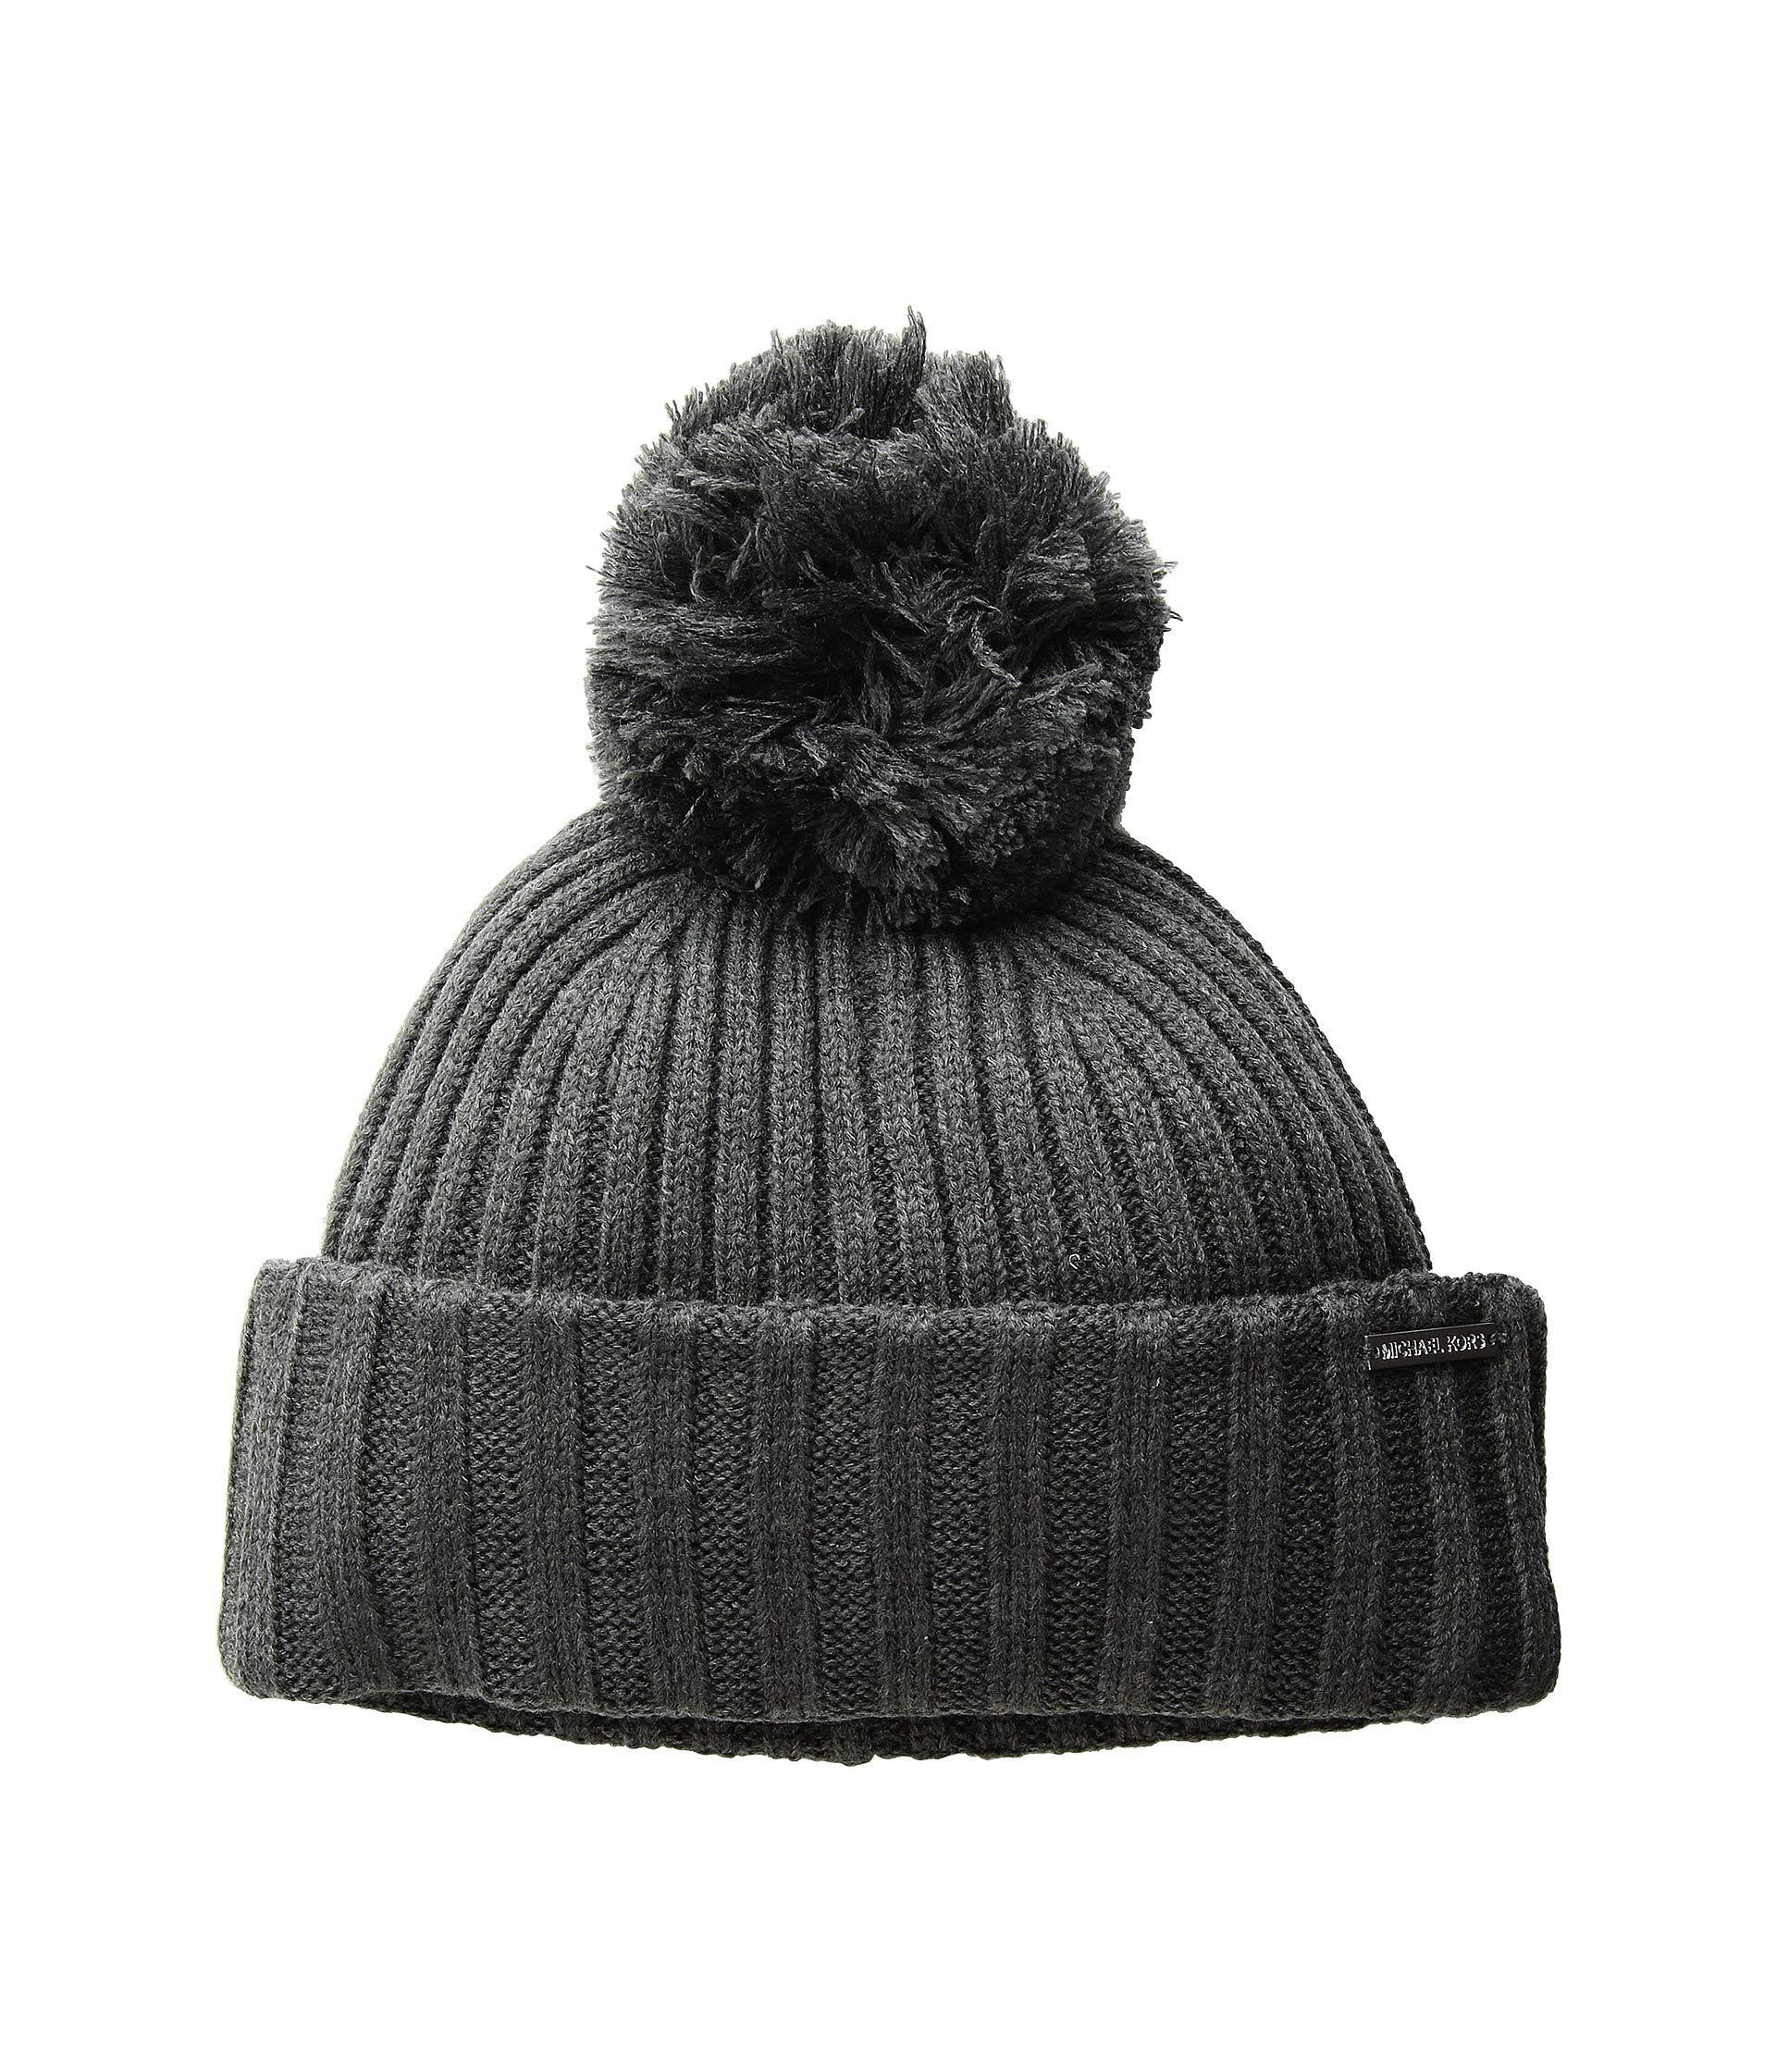 Lyst - Michael Michael Kors Rib Cuff Hat (cream gold) Cold Weather ... 5ace8f5e93a8